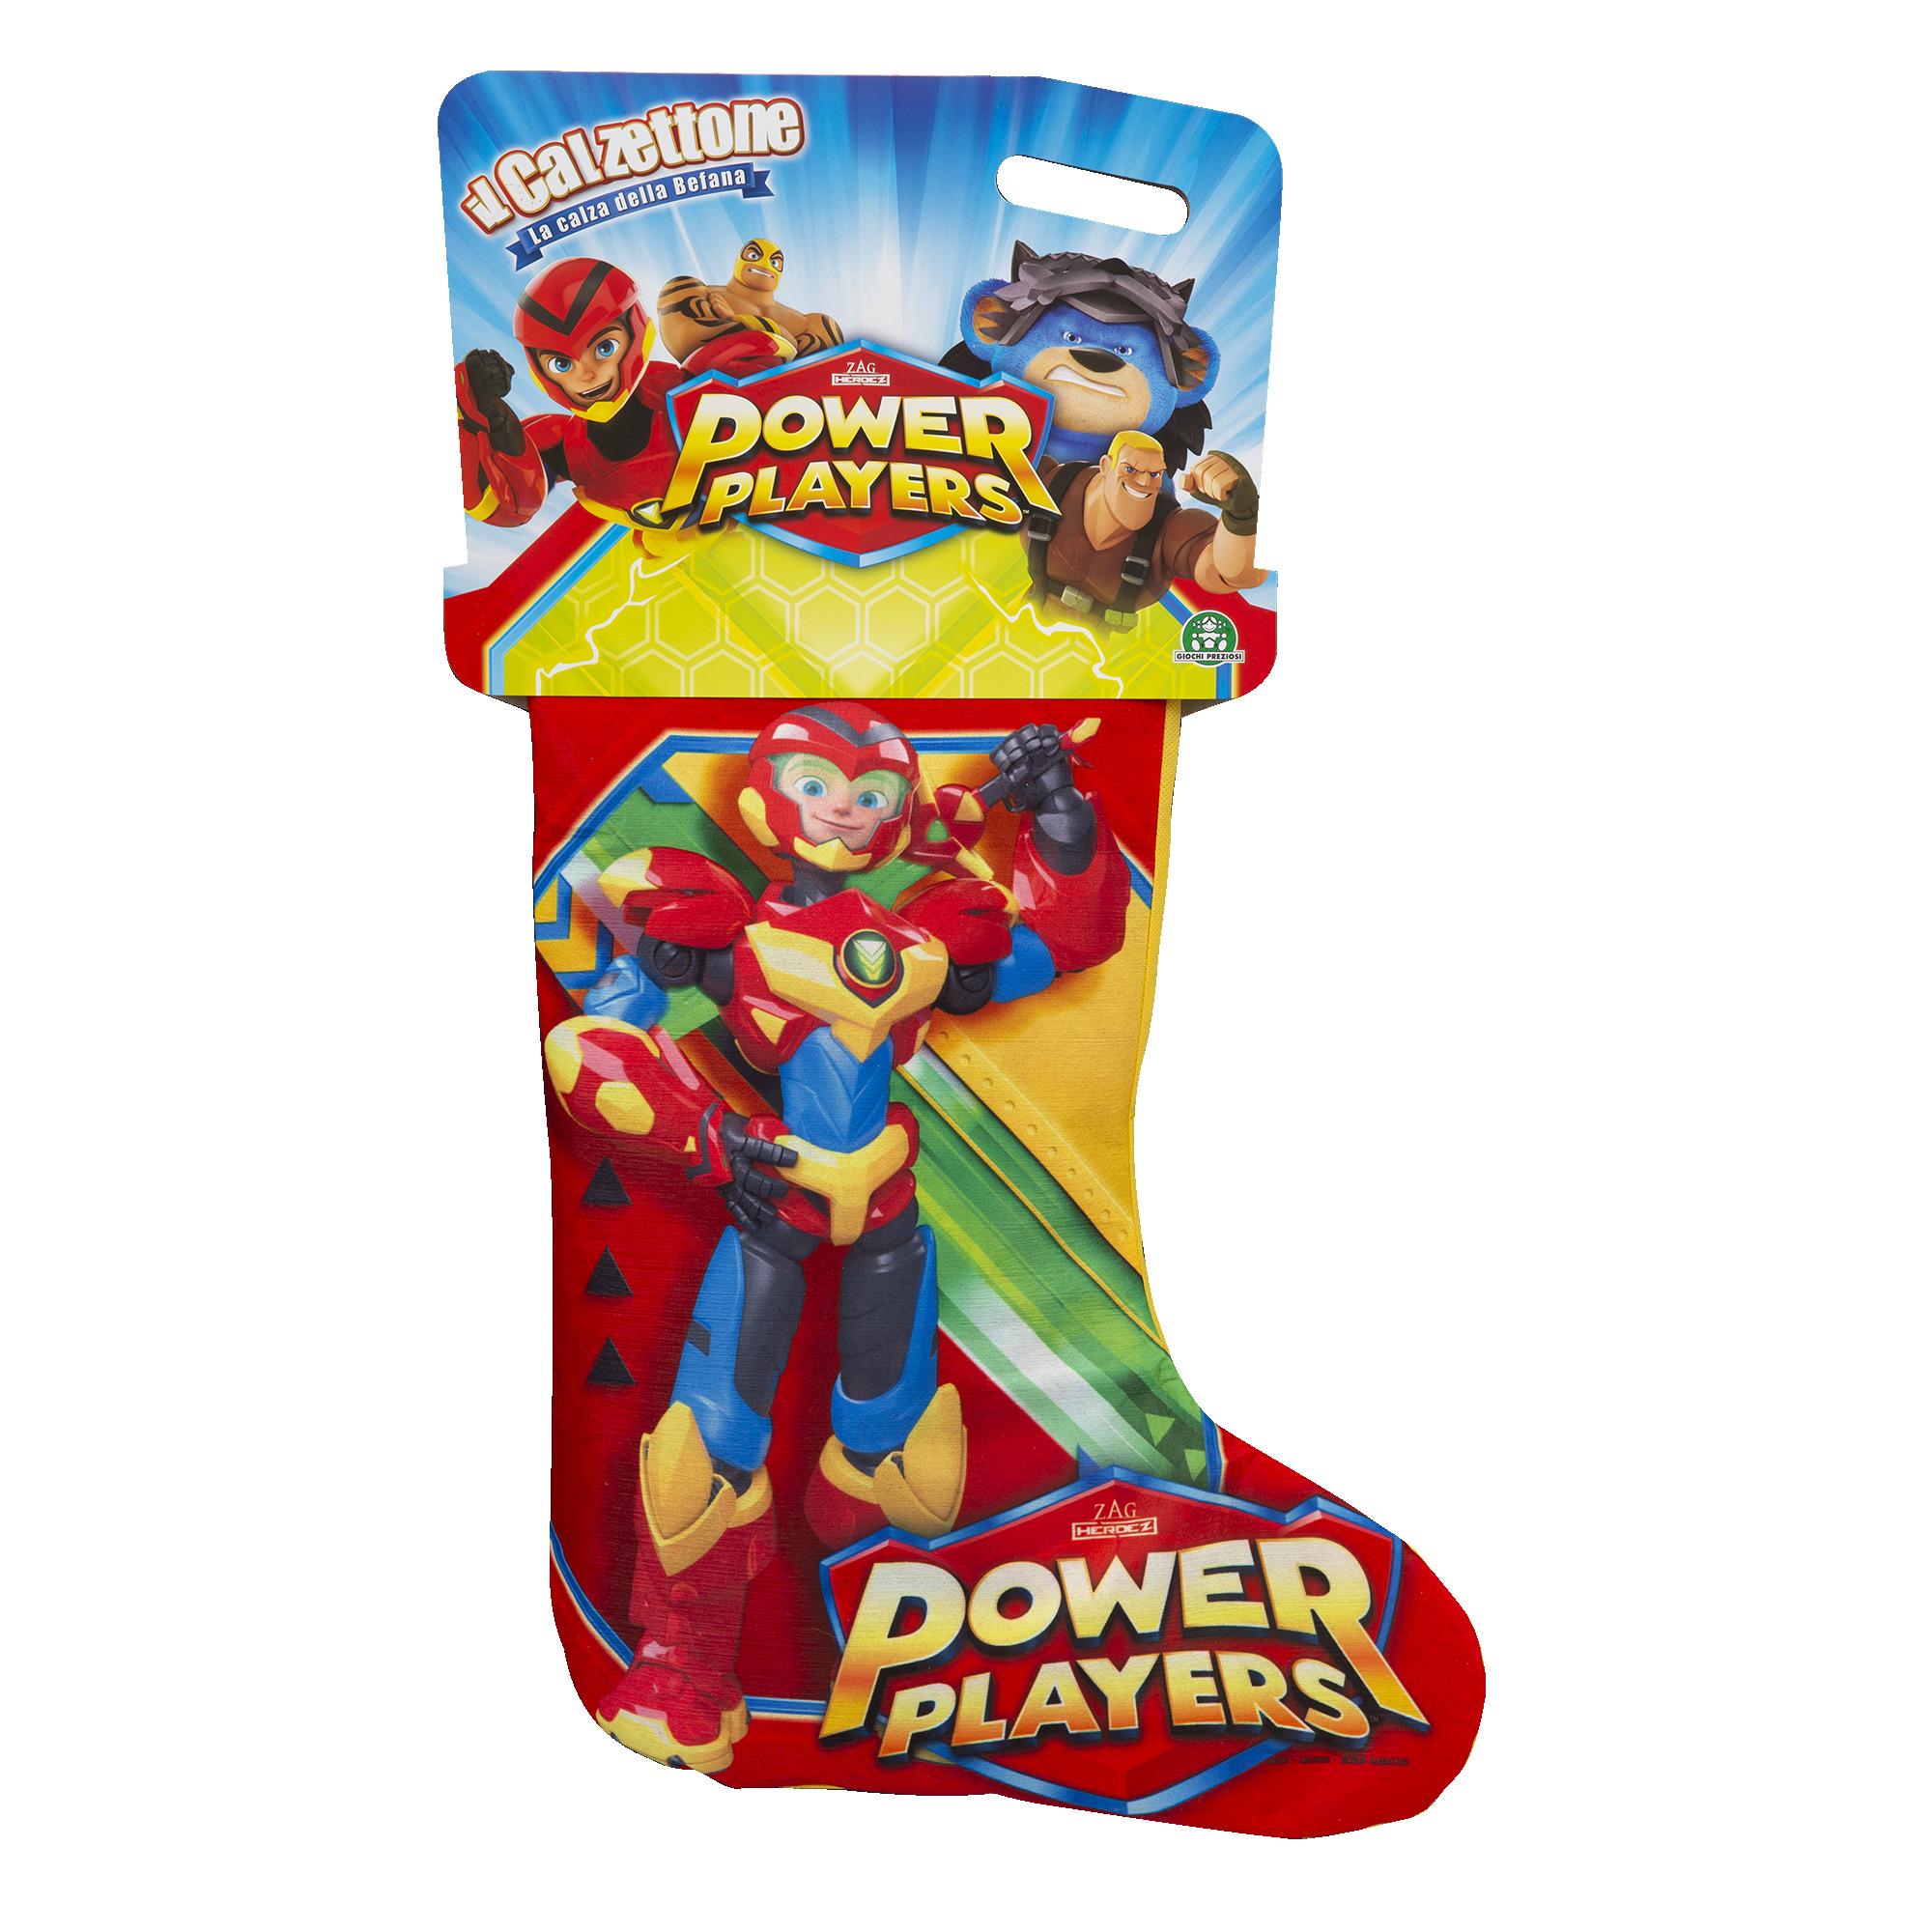 Calzettone Power Player 2021